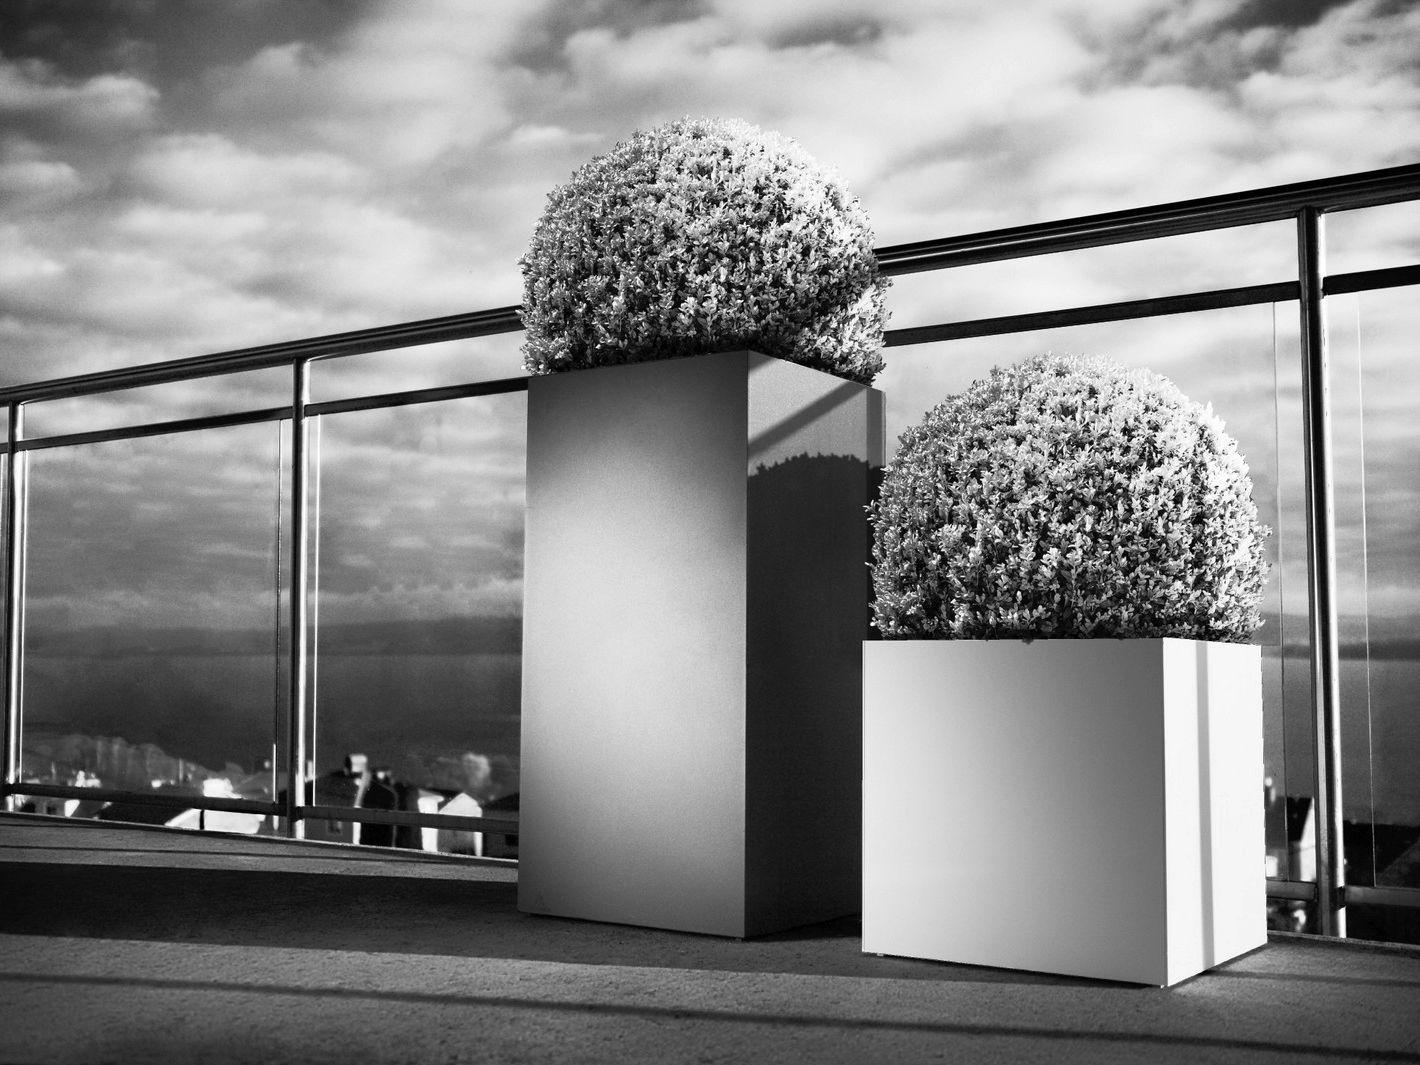 linn hoch blumenkasten by r shults design cornelia norgren. Black Bedroom Furniture Sets. Home Design Ideas